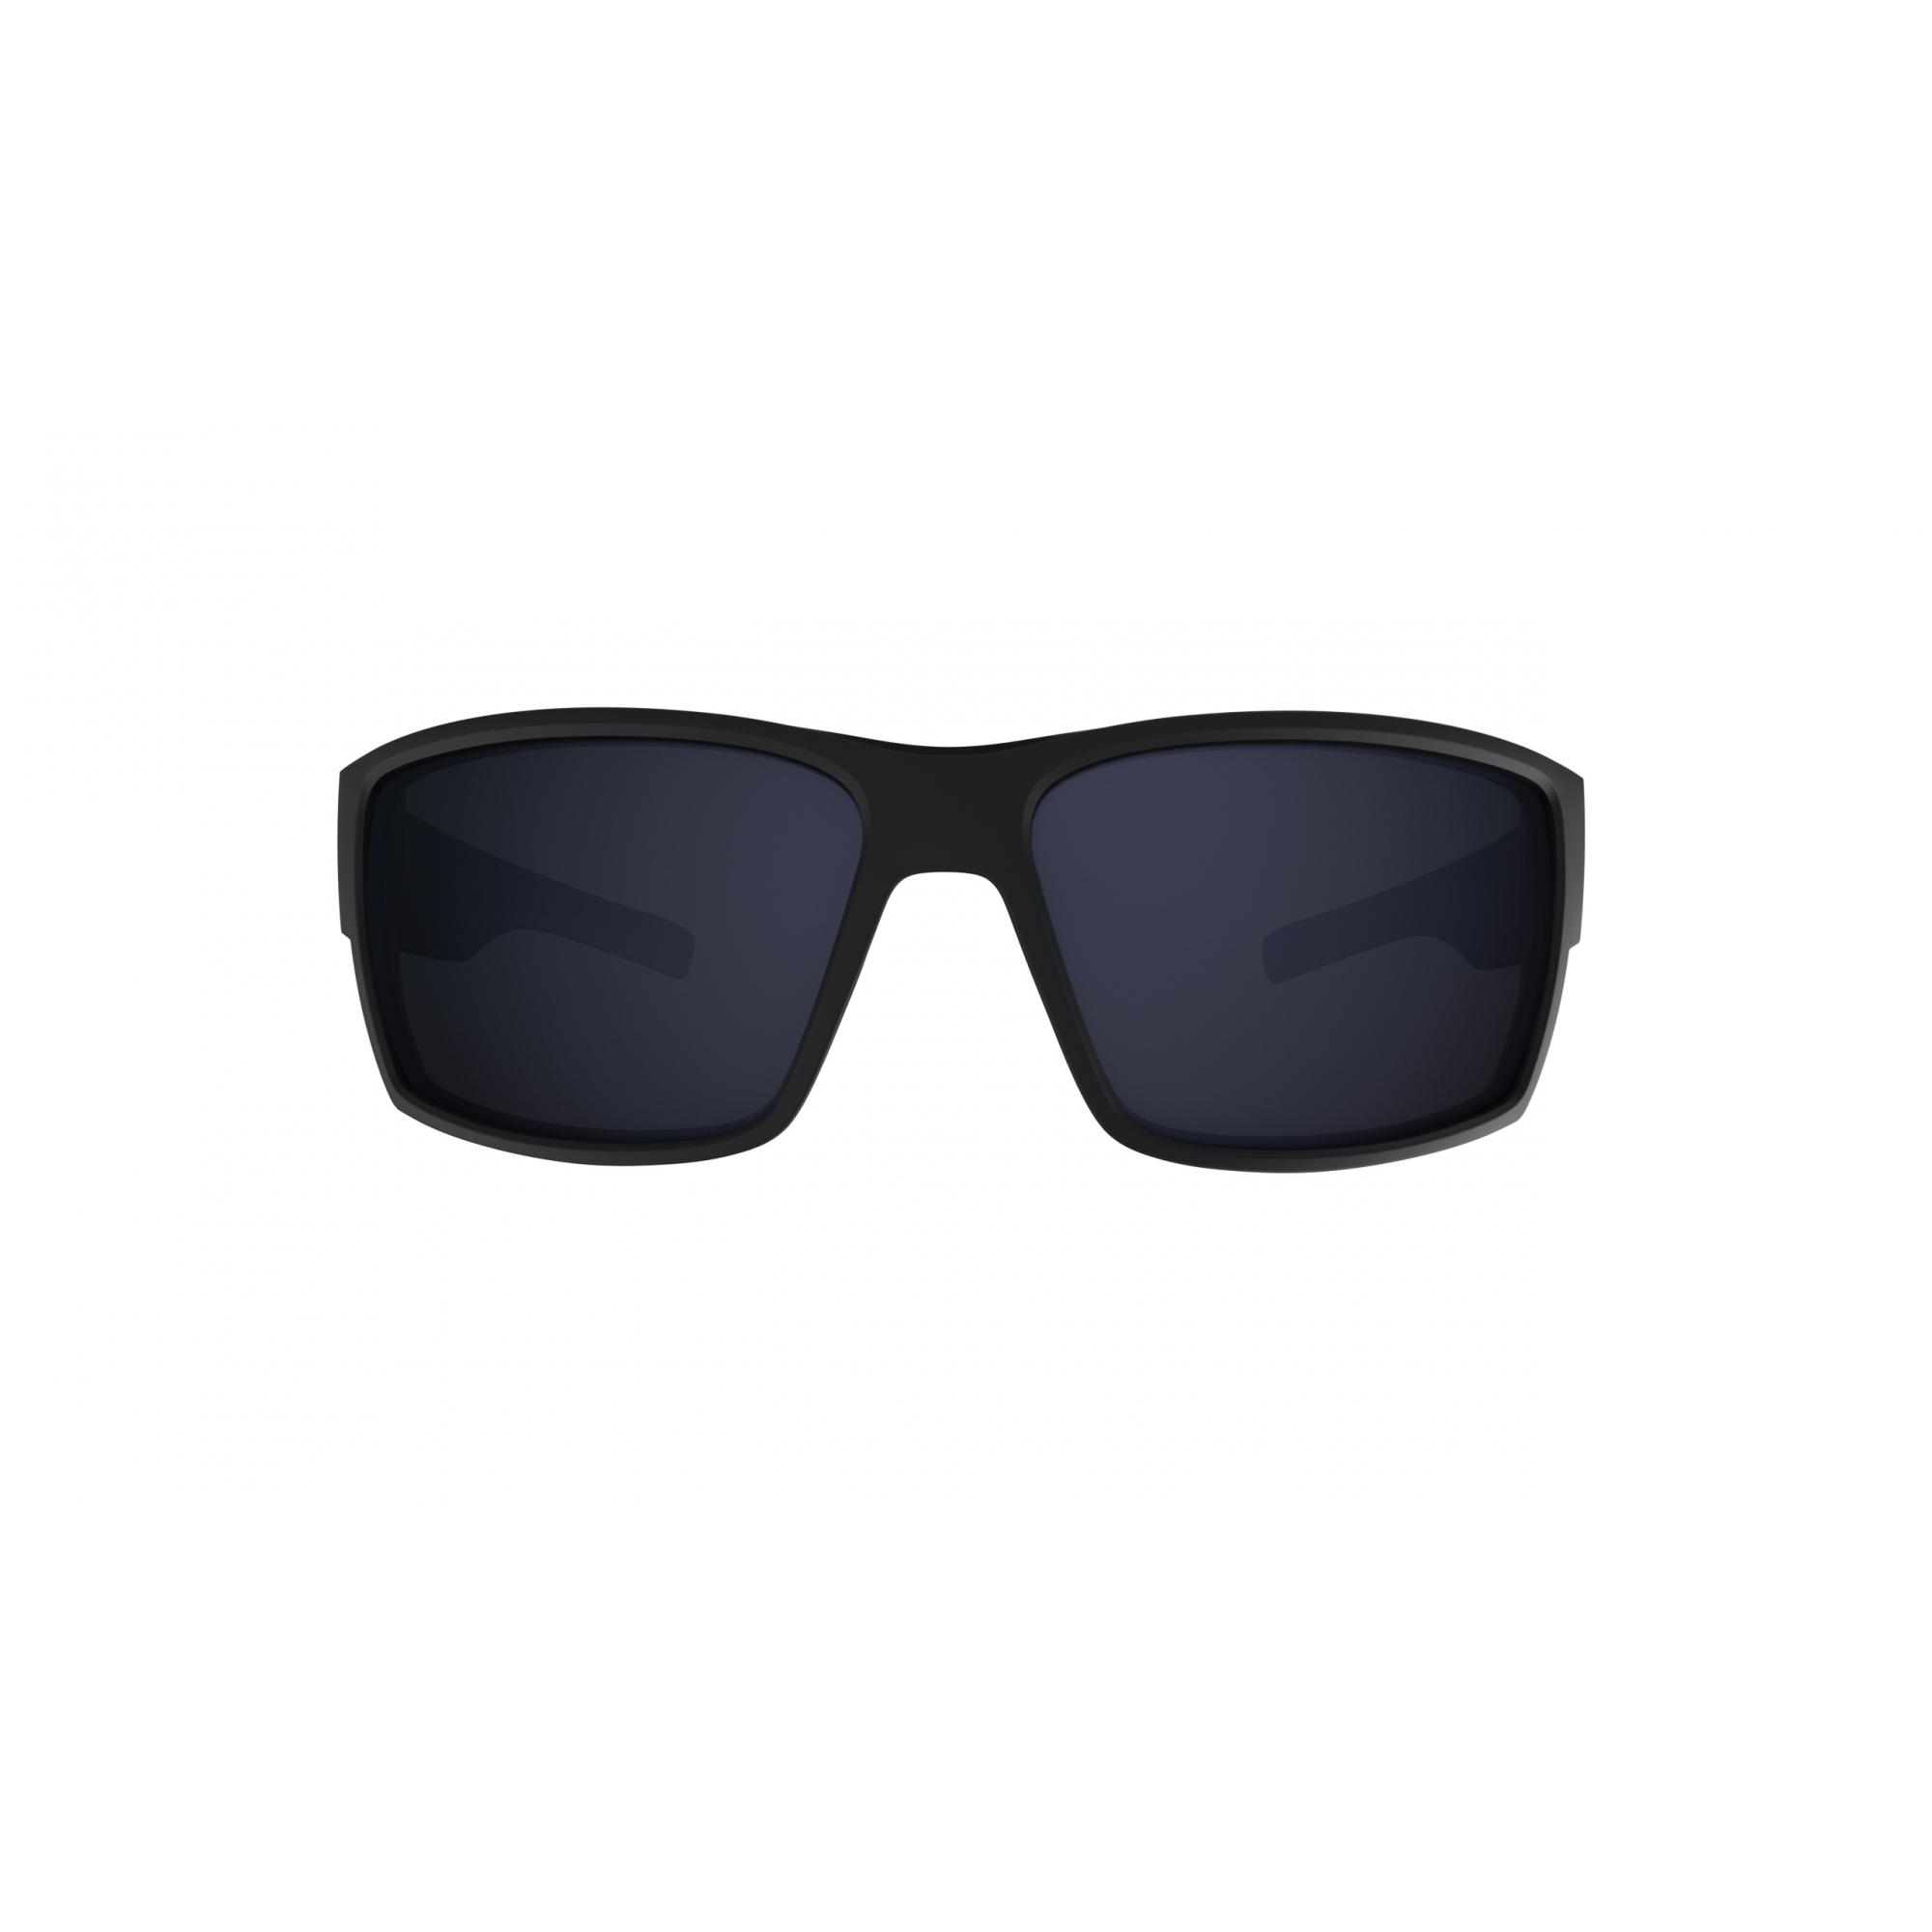 Óculos HB Narrabeen Matte Black Gray